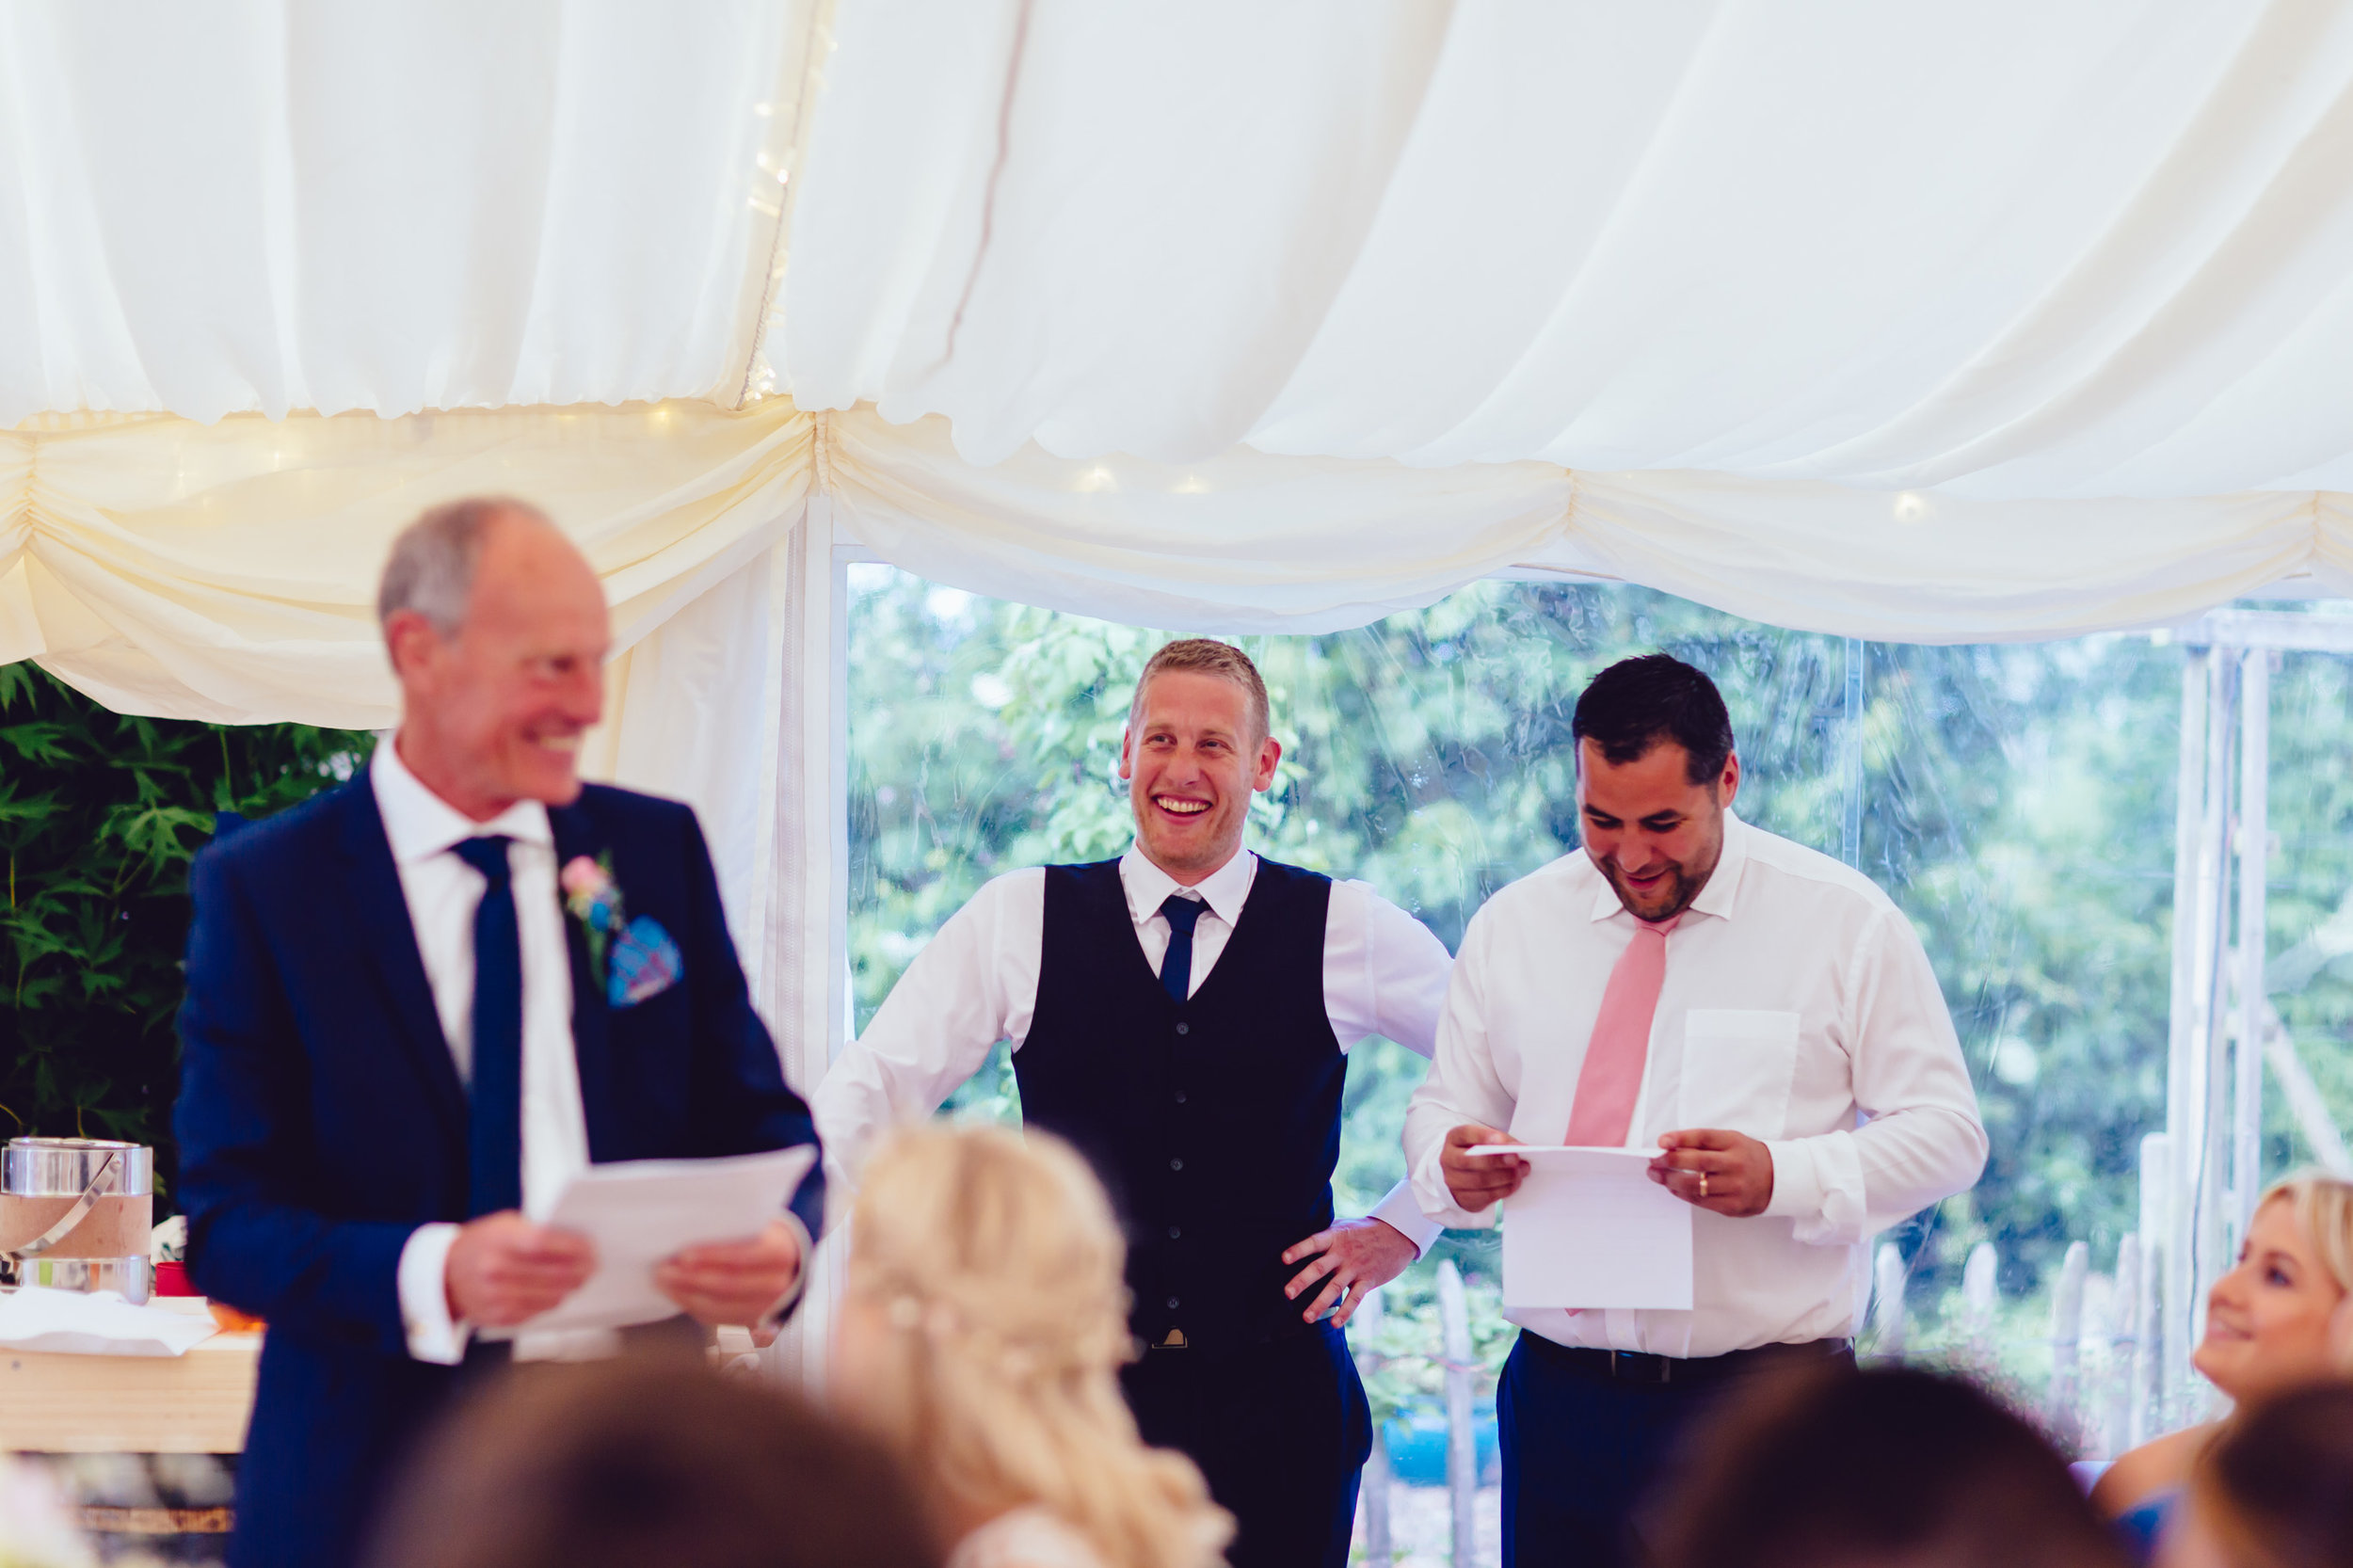 Birmingham photographer wedding country artistic wedding photography47.jpg